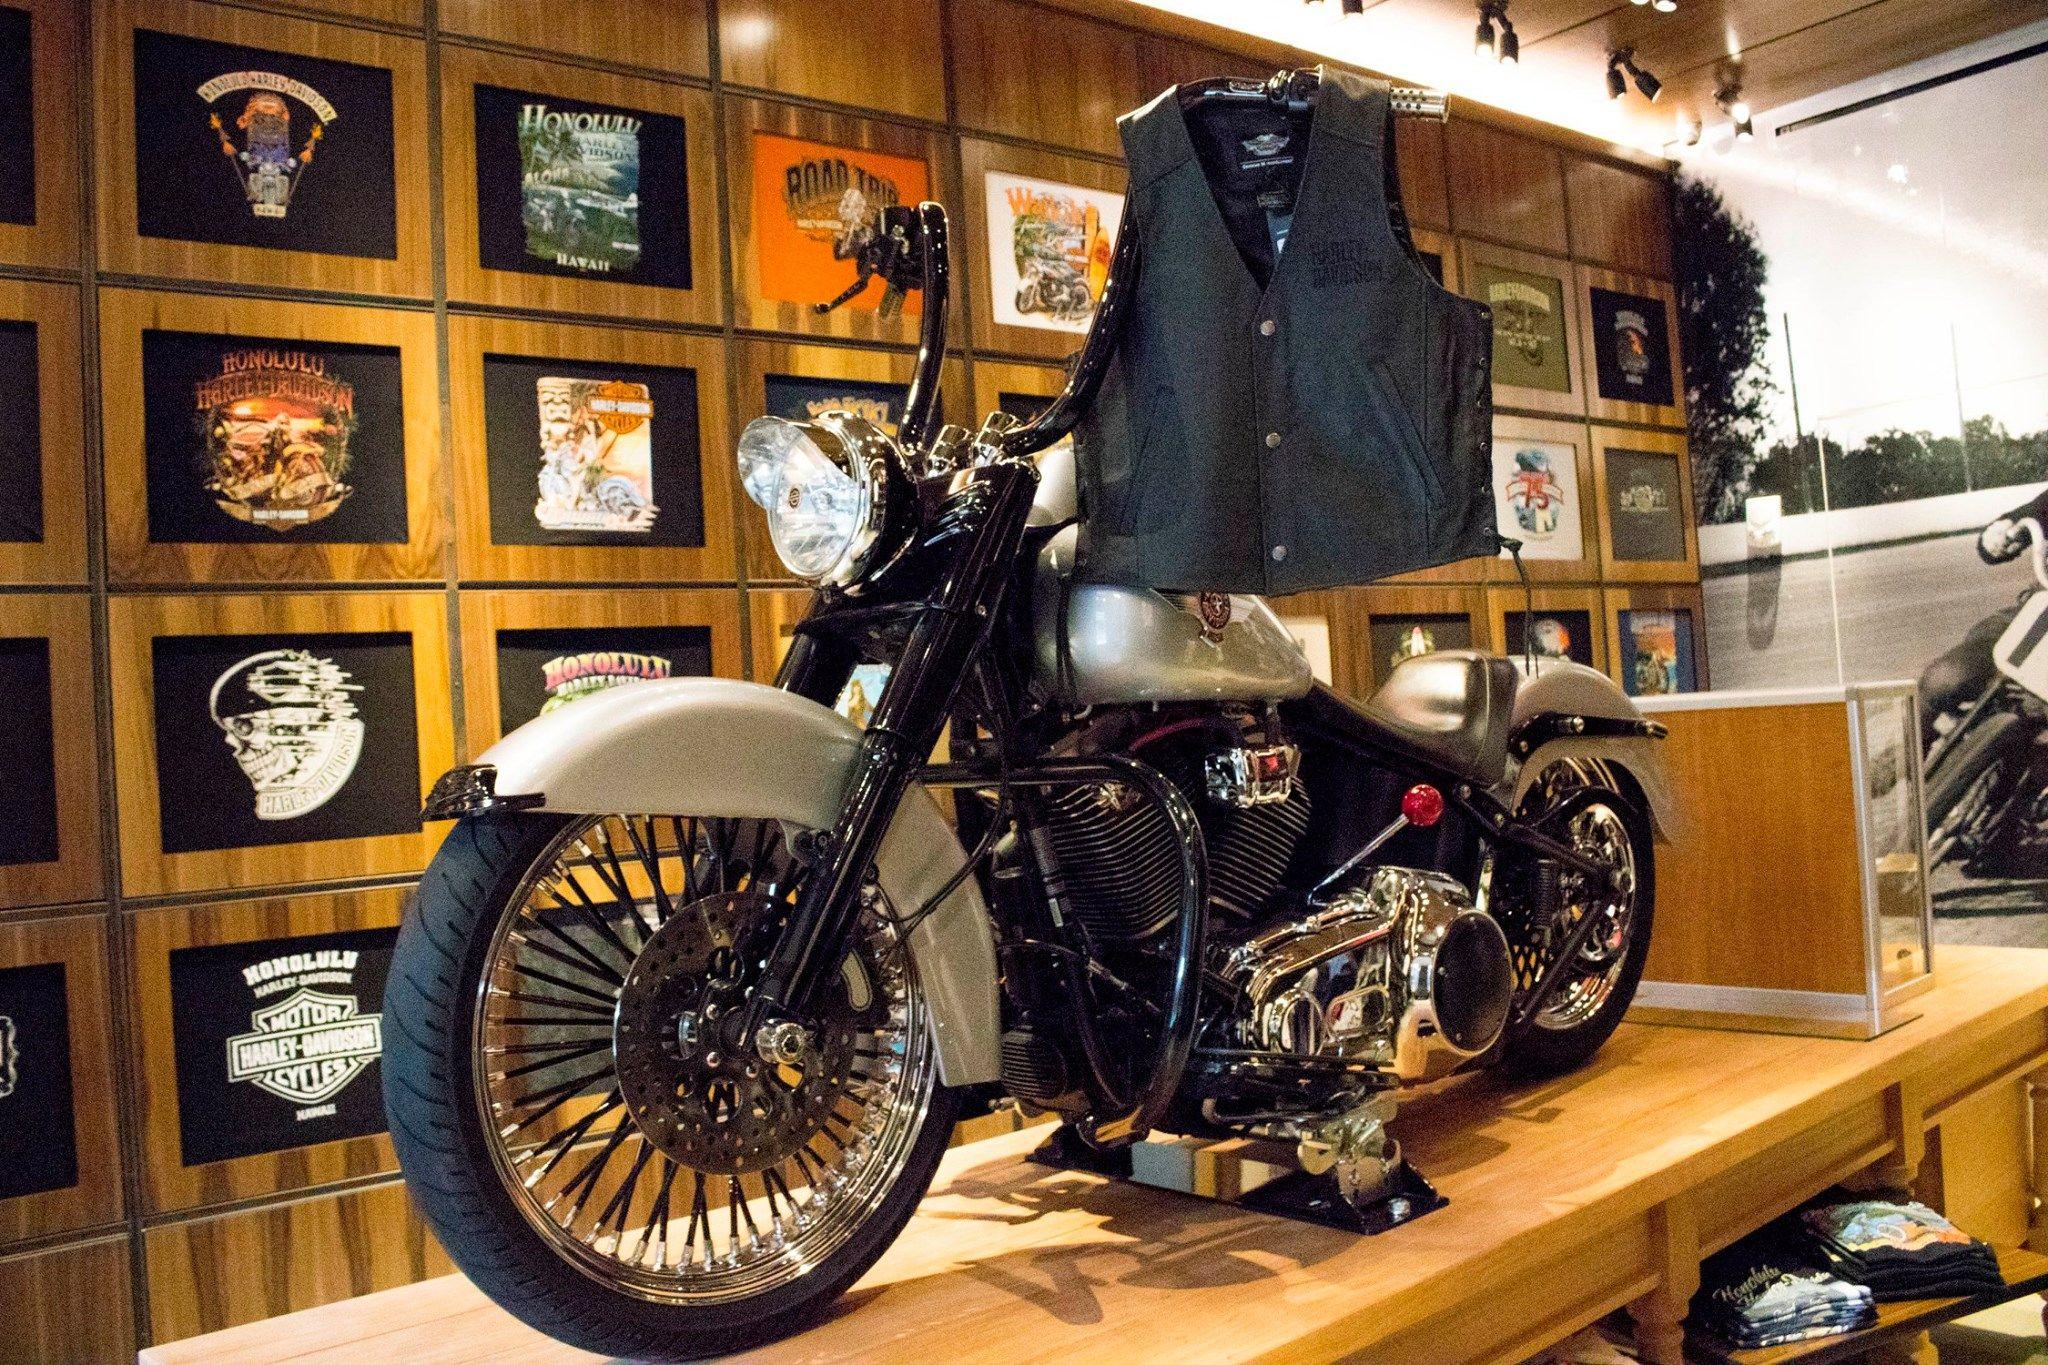 New Location At The International Marketplace In Waikiki Hawaii Harley Davidson Harley Clothes For Women